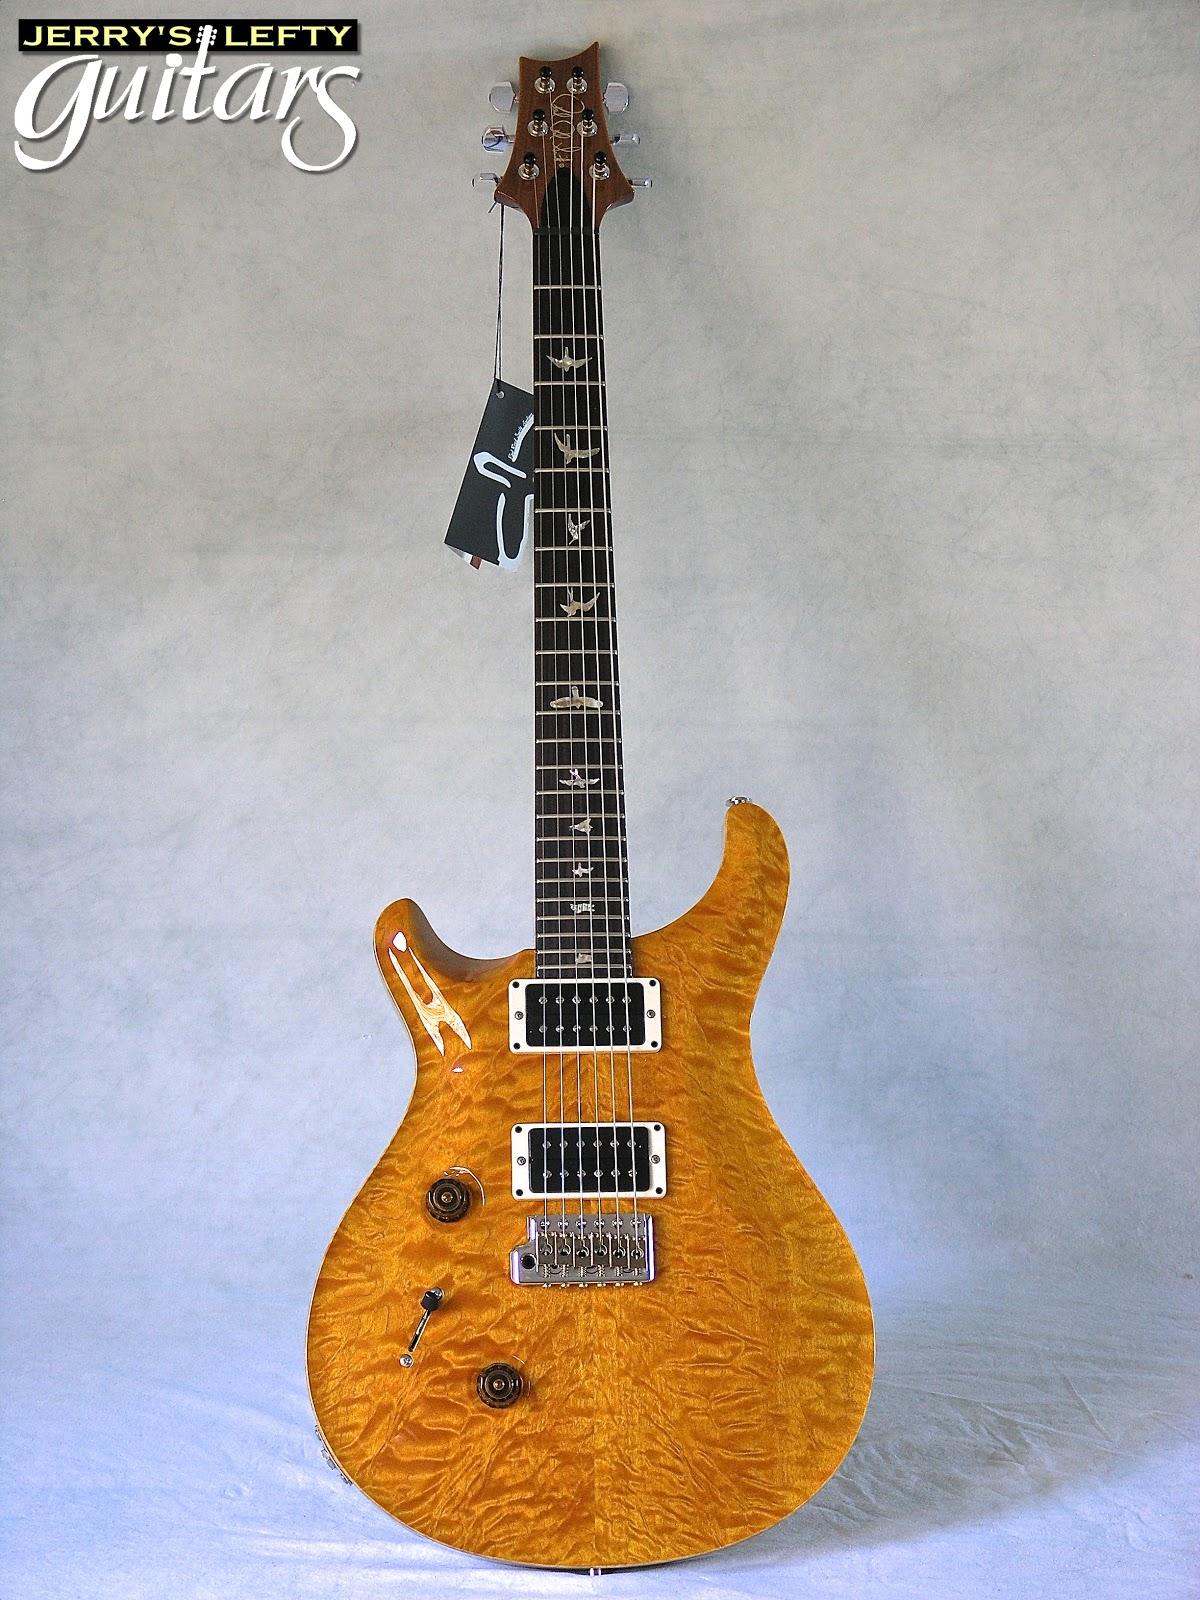 jerry 39 s lefty guitars newest guitar arrivals updated weekly prs custom 24 quilt santana. Black Bedroom Furniture Sets. Home Design Ideas